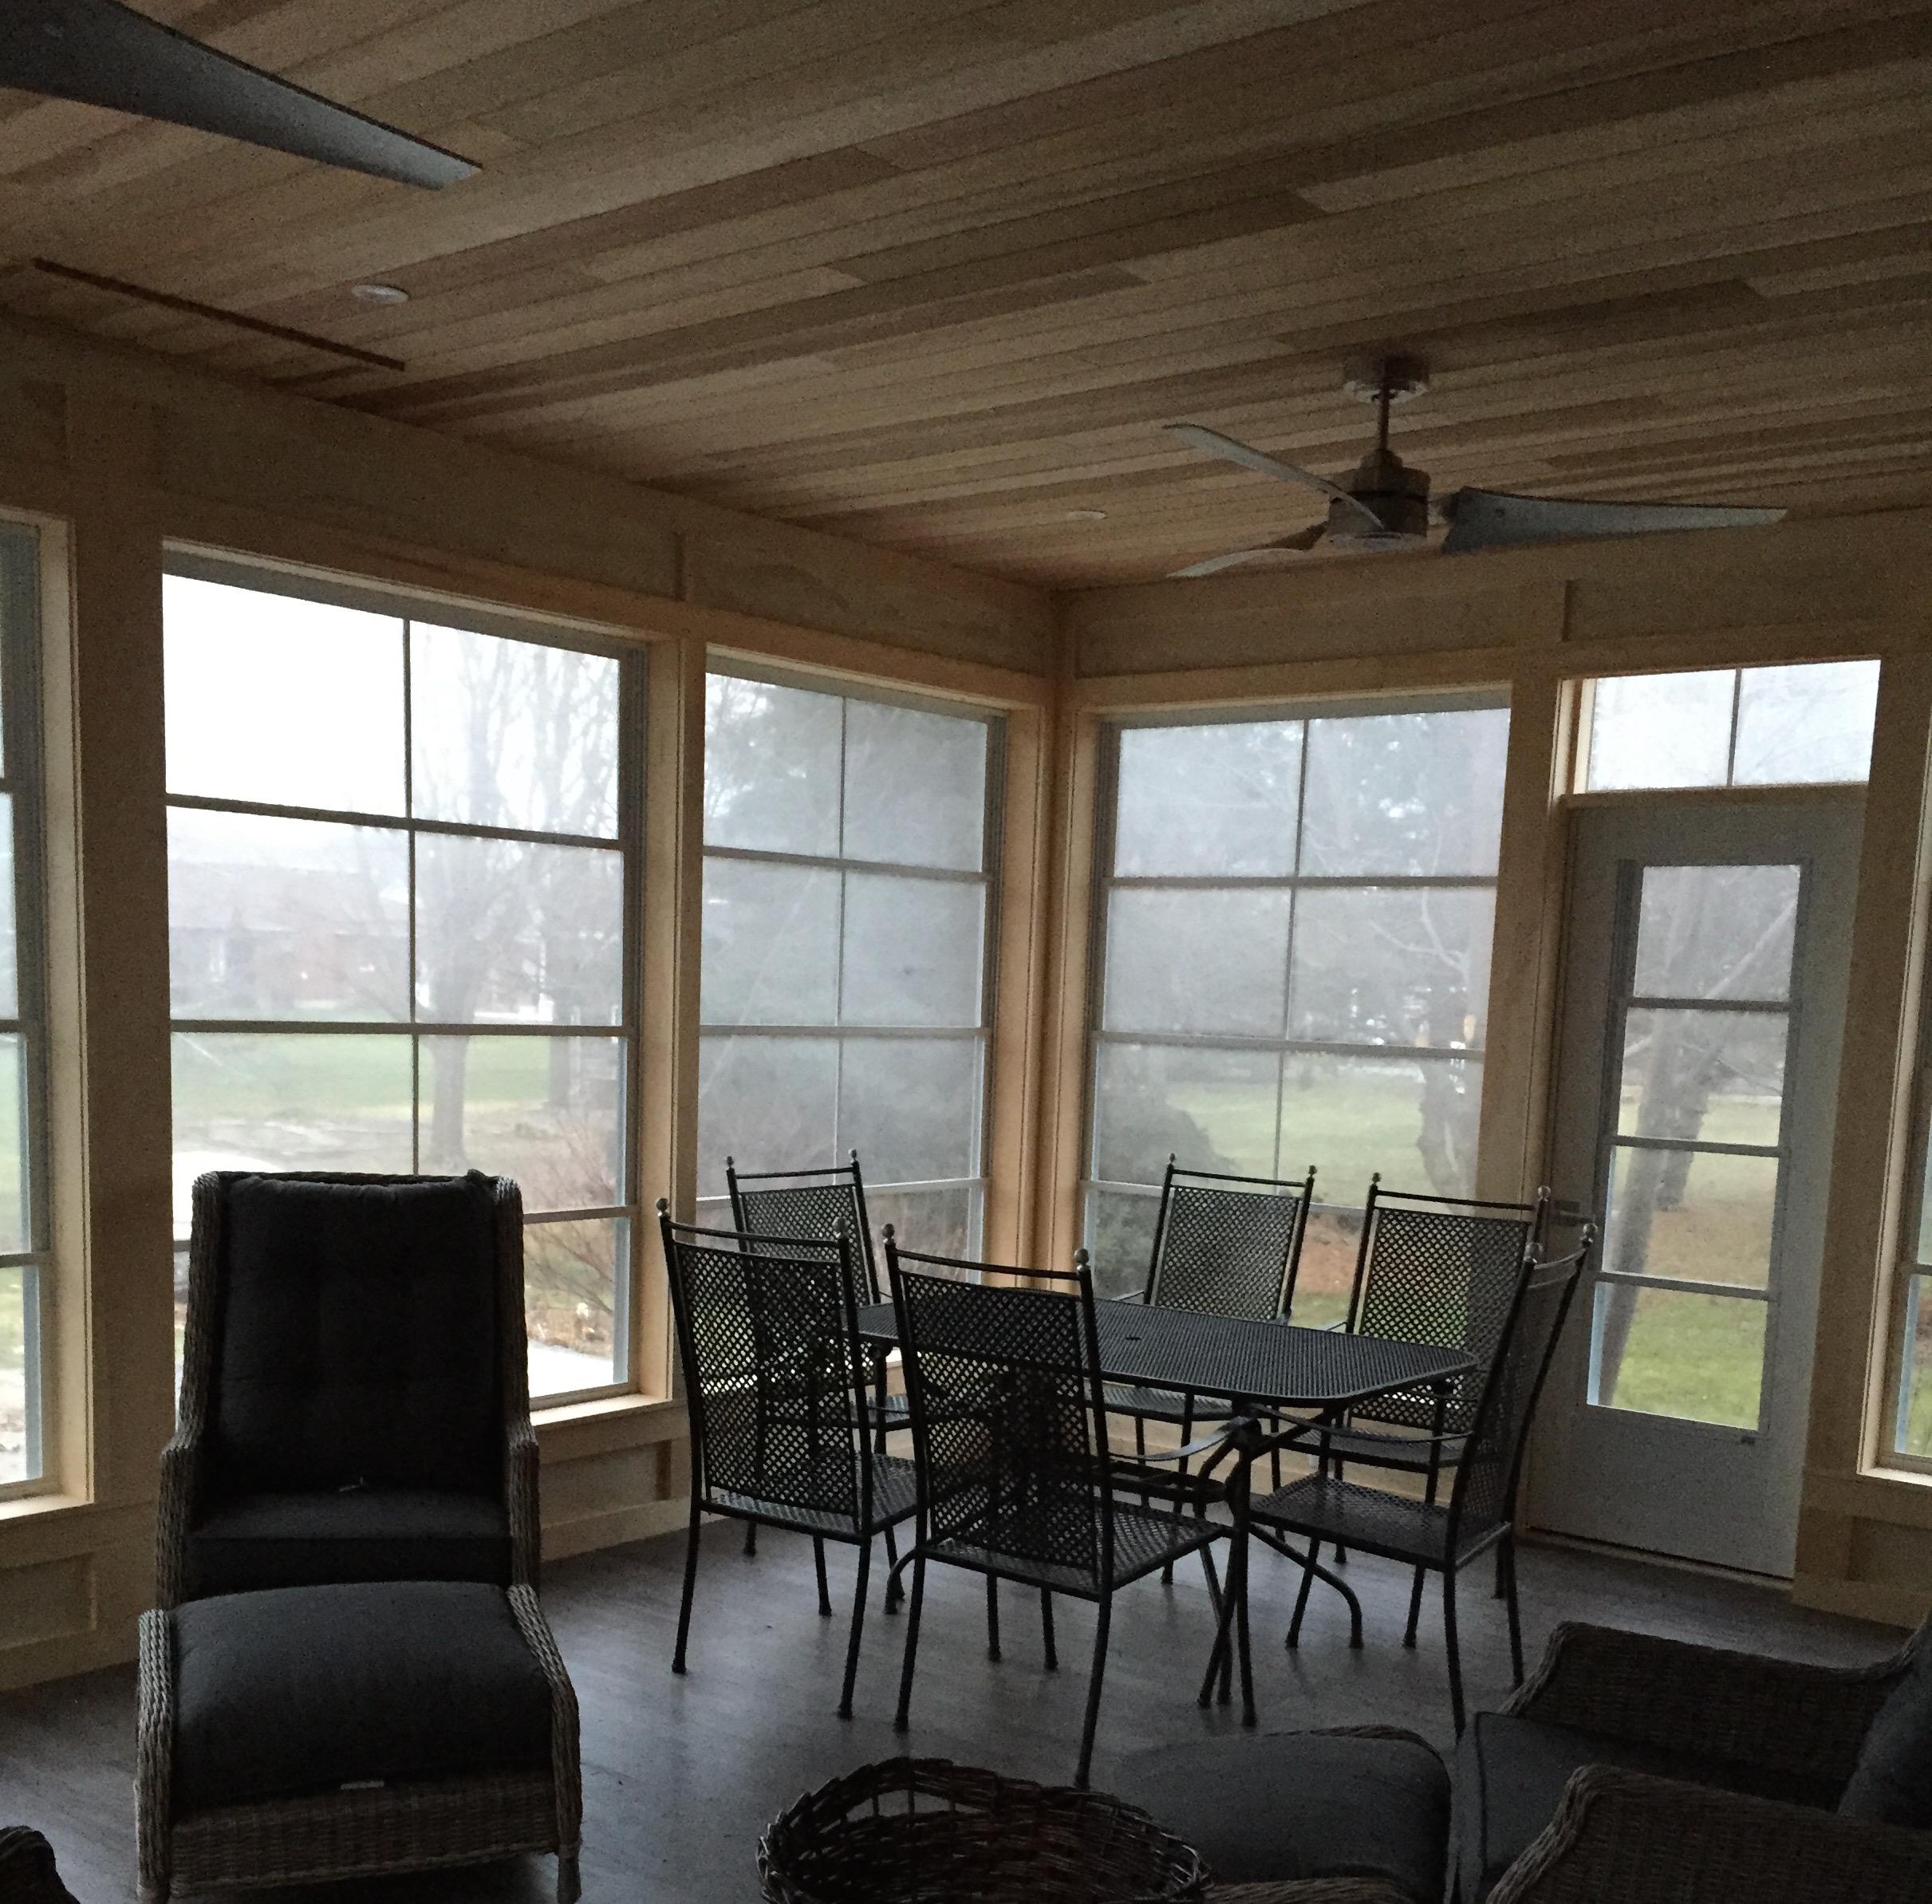 Sunroom interior 1